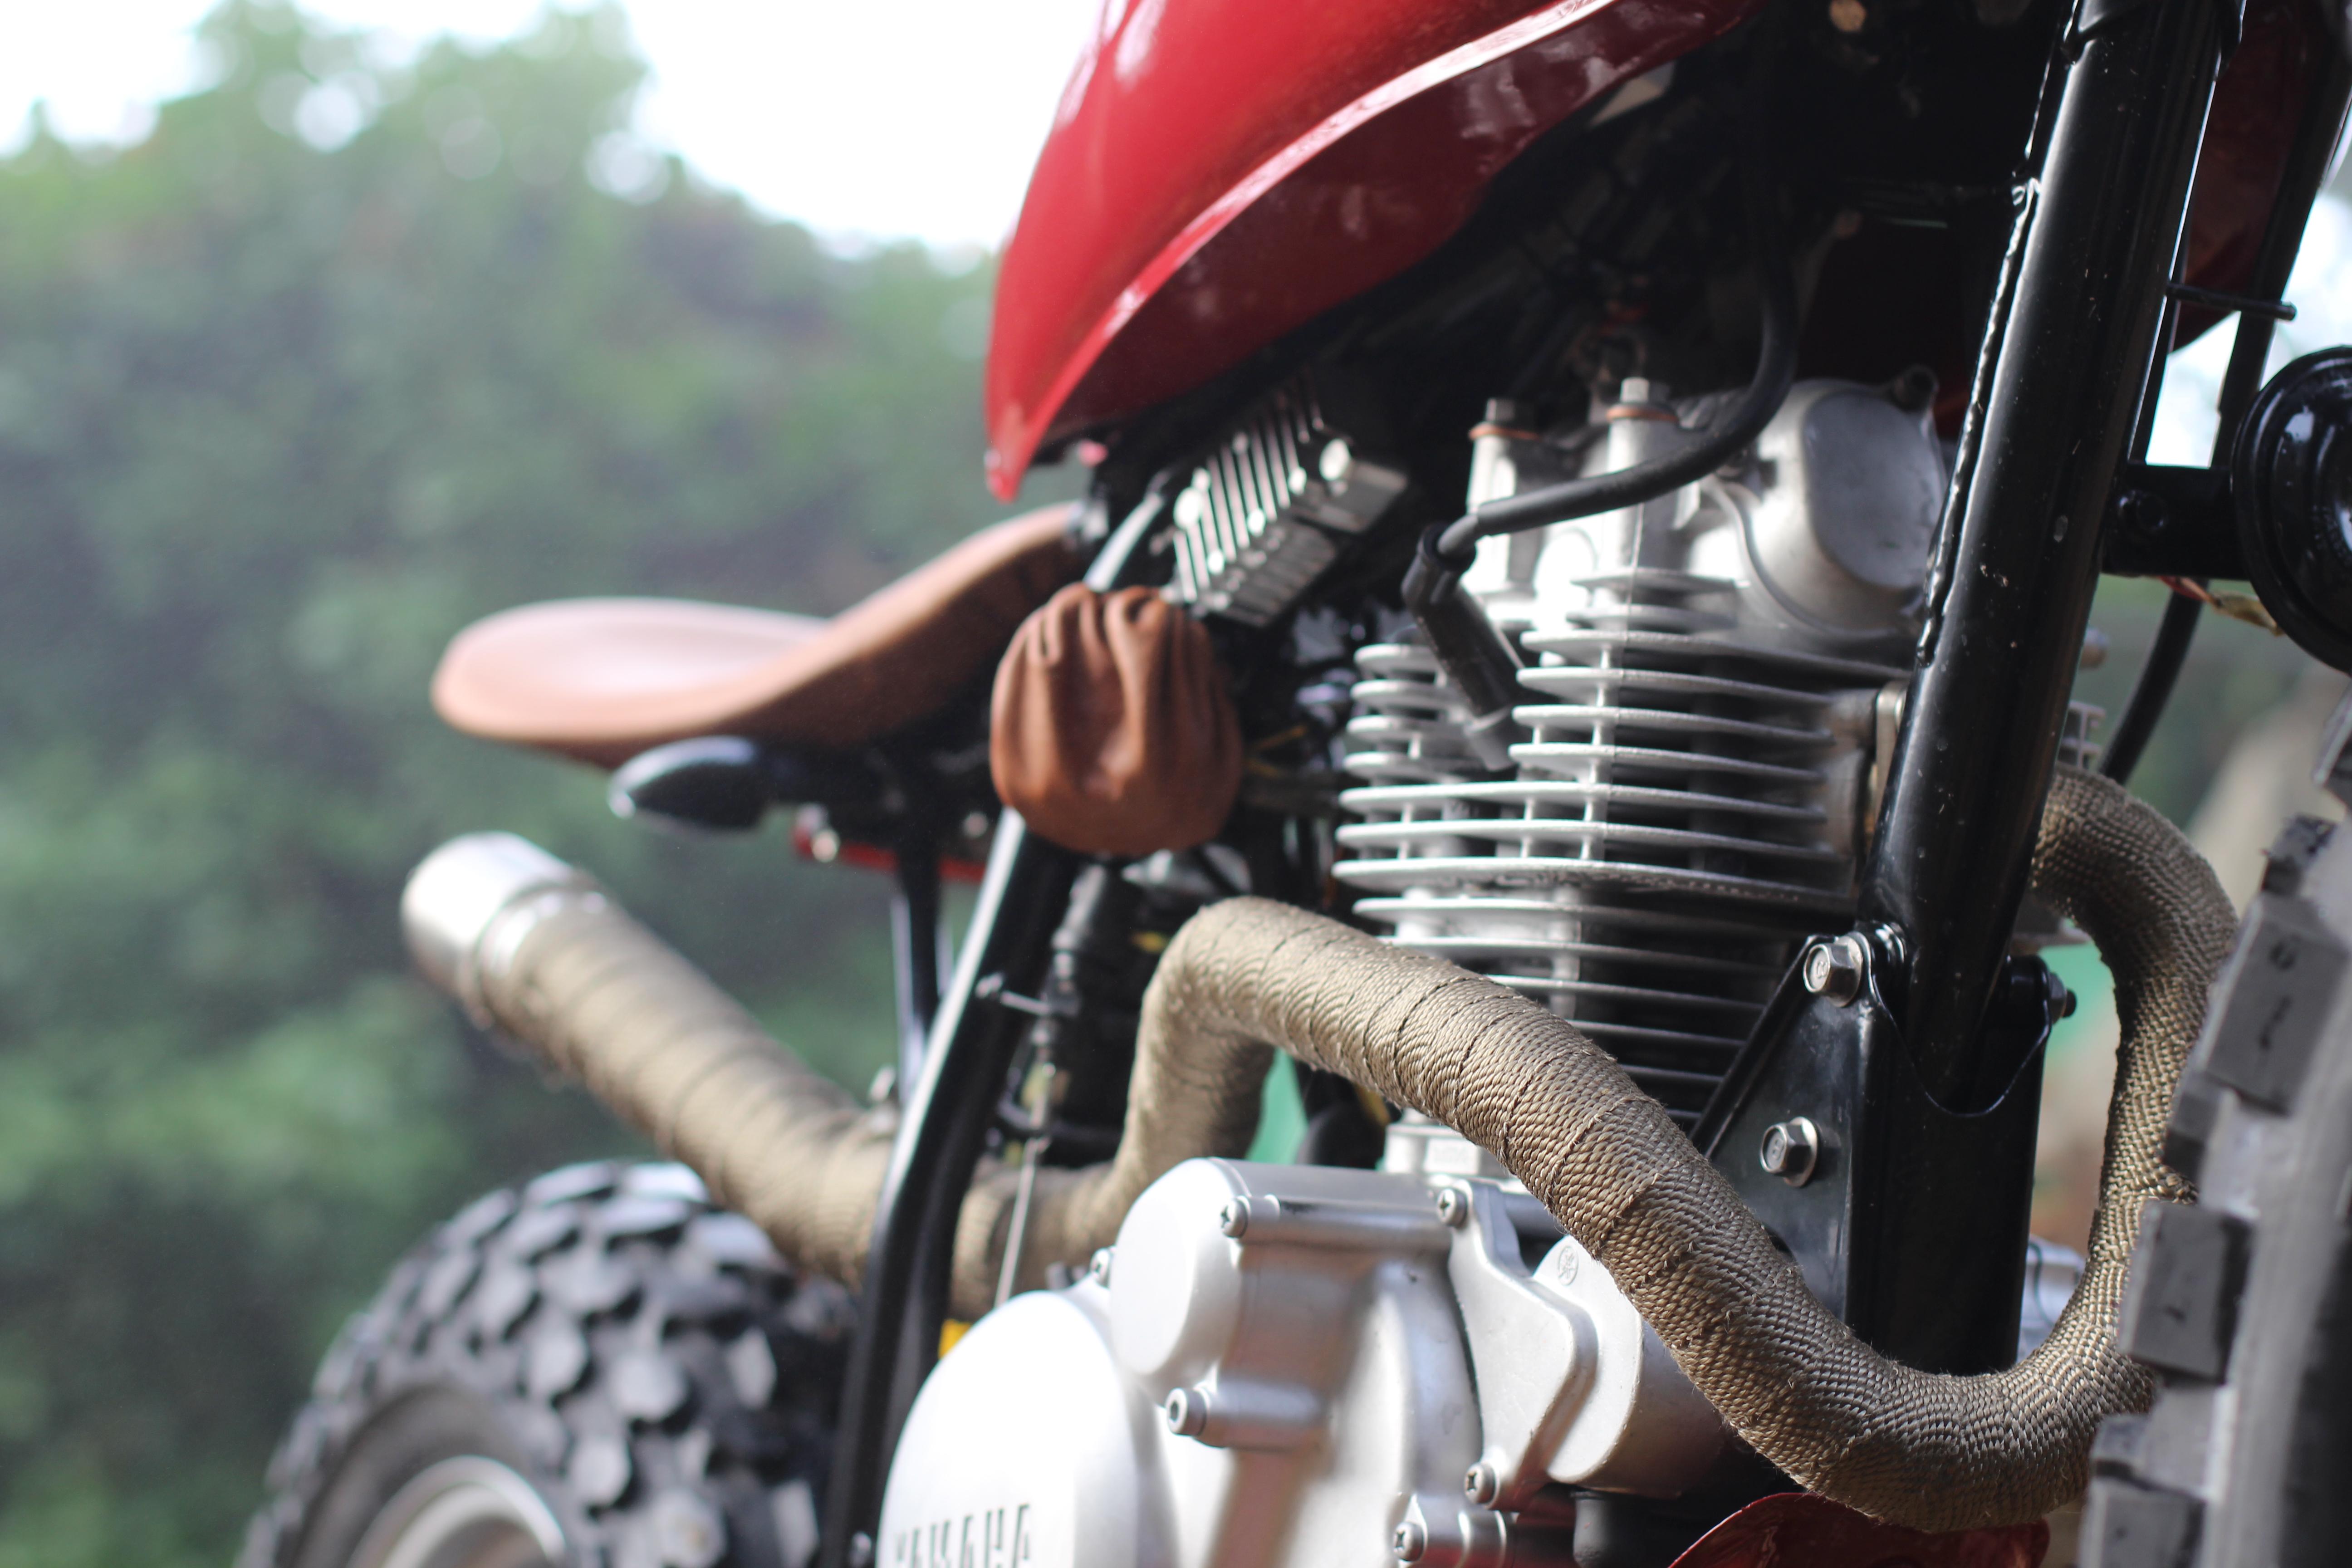 Red TU125 engine